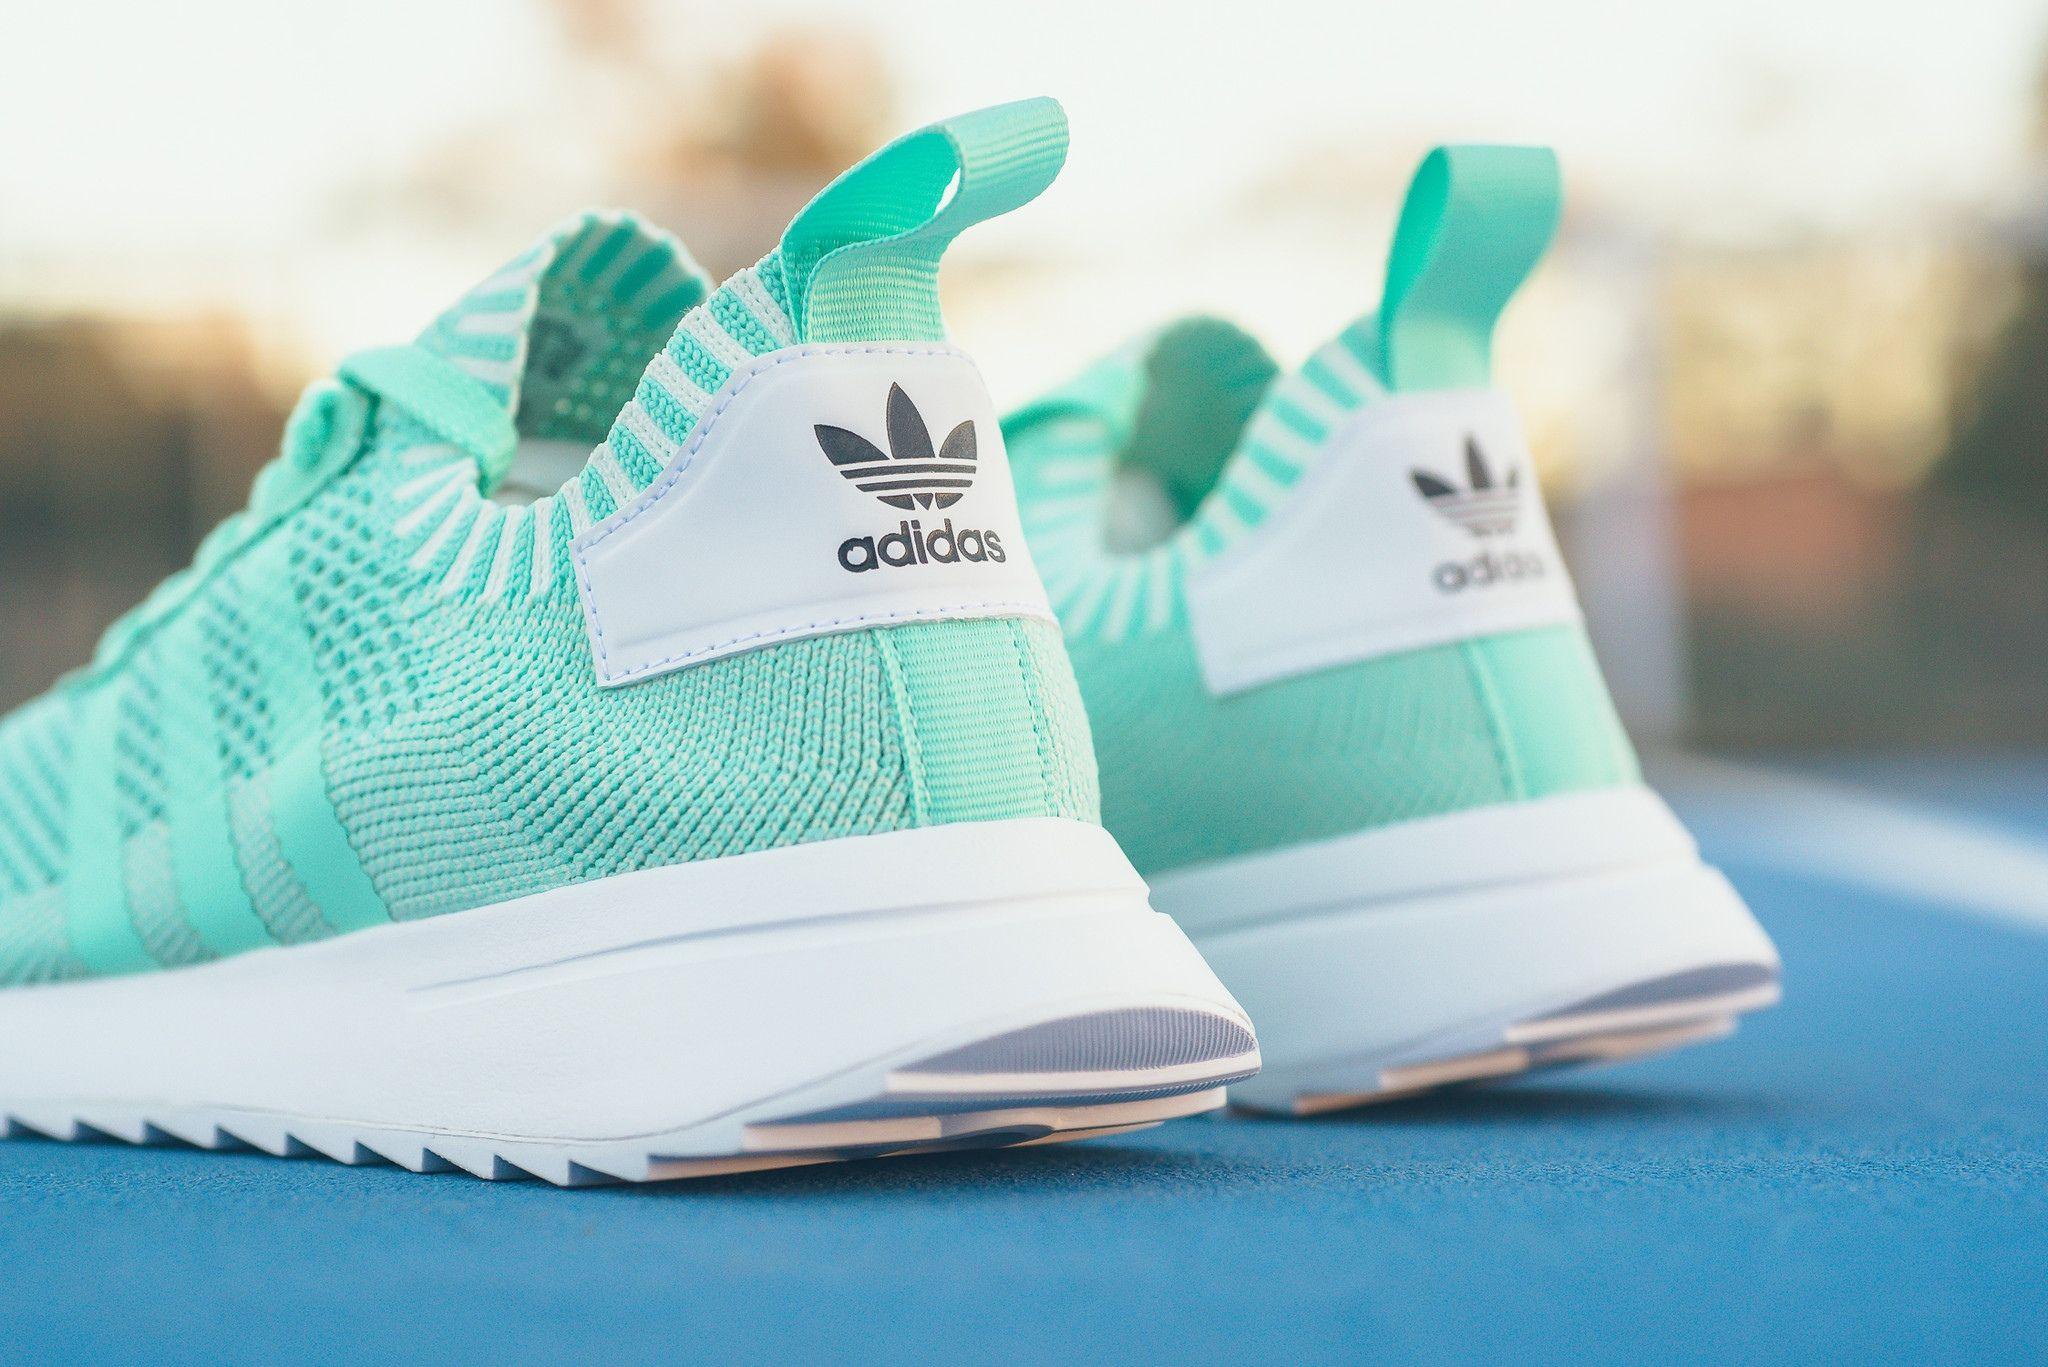 Wmns Adidas Womens Flashback Primeknit Pk Sneaker Politics Hyebeast 15